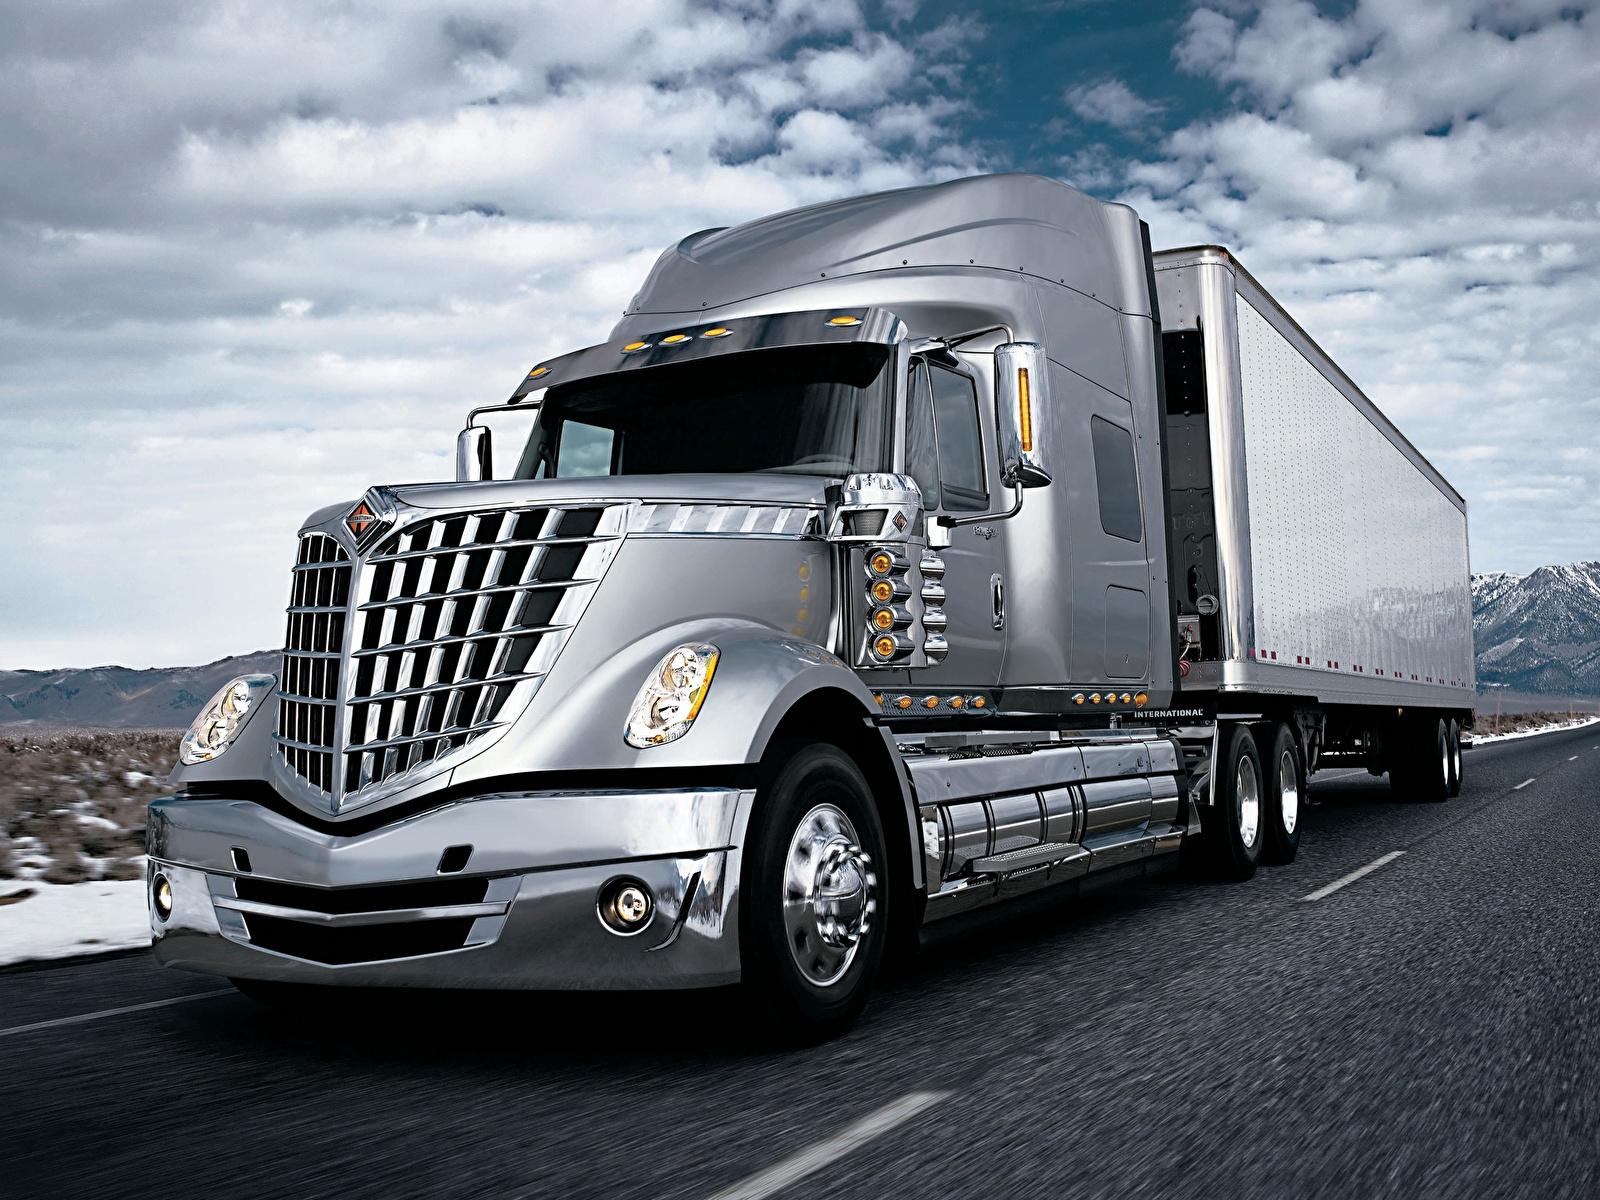 Photos lorry International international cxt automobile